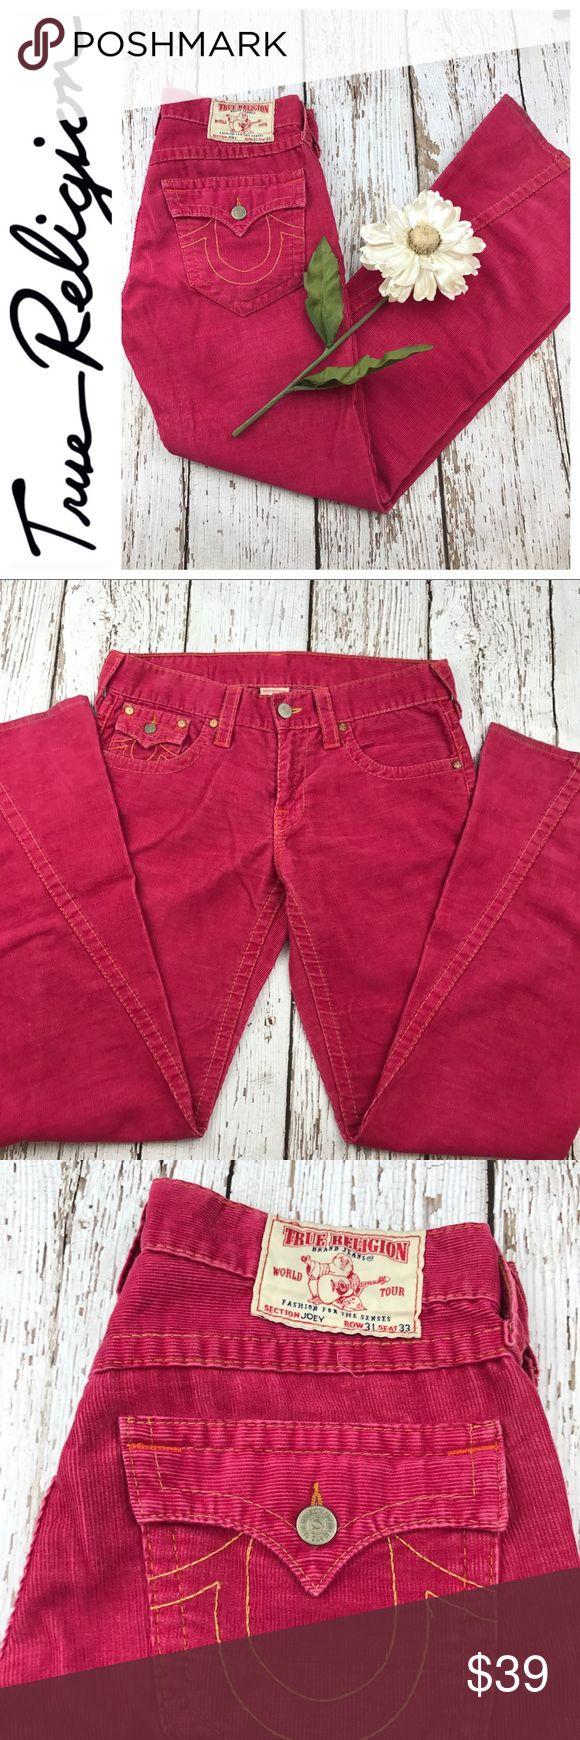 "💕SALE💕True Religion Joey Coral Corduroy Jeans Fabulous 💕SALE💕True Religion Joey Coral Corduroy Jeans 33"" Inseam 10"" Rise 17"" across Waist Laying flat True Religion Jeans"